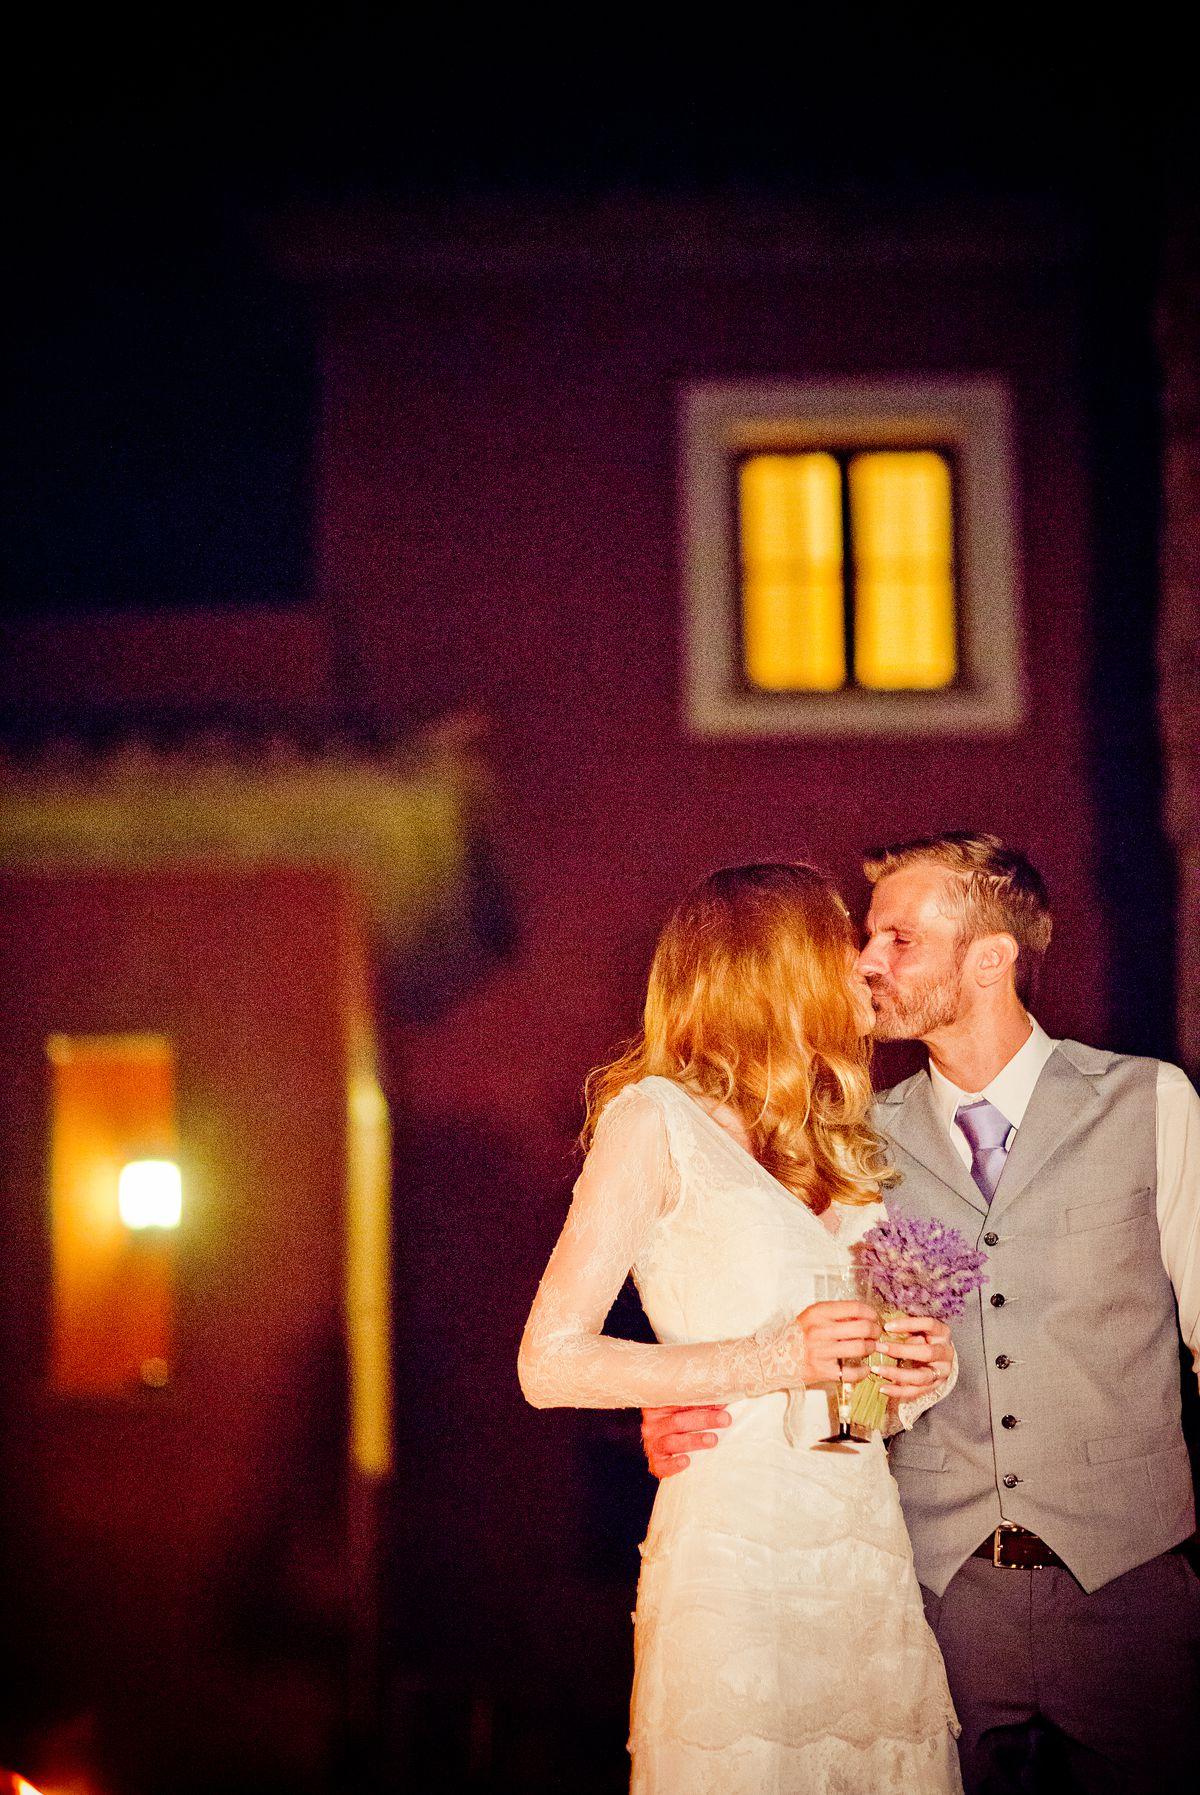 Mallorca-Hochzeit-051.jpg